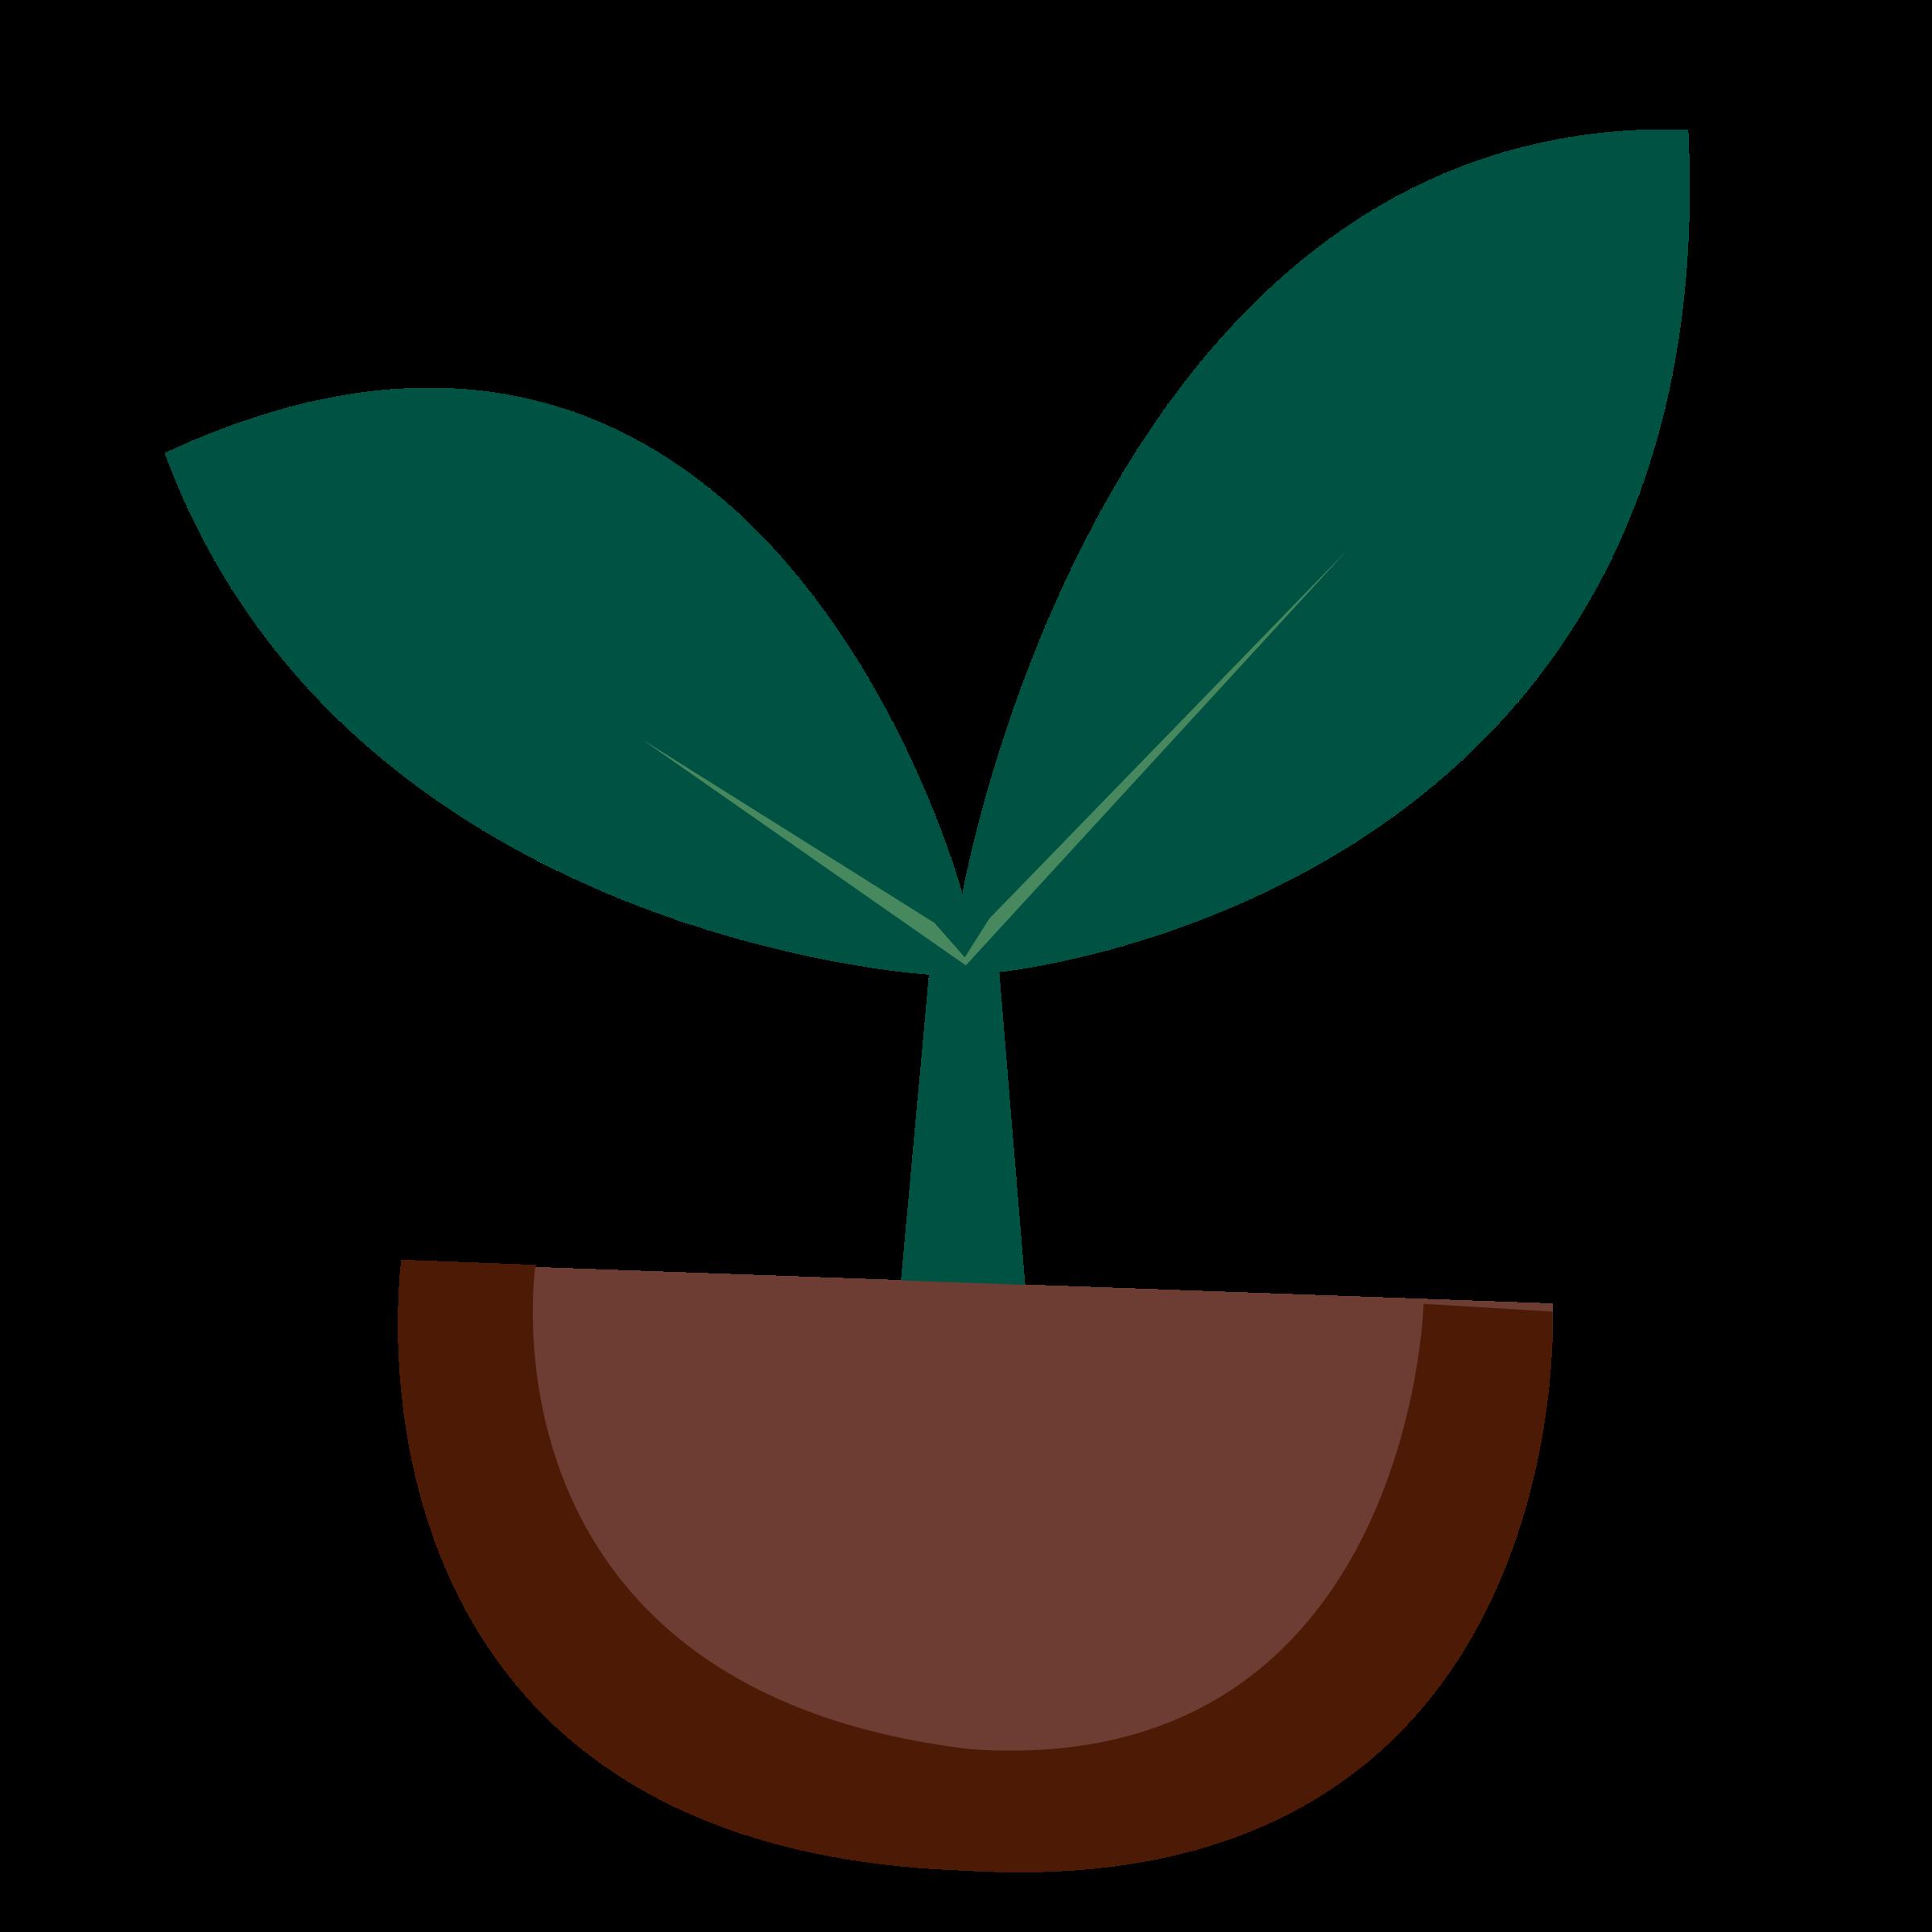 Clip art plant clipart stonetire free images